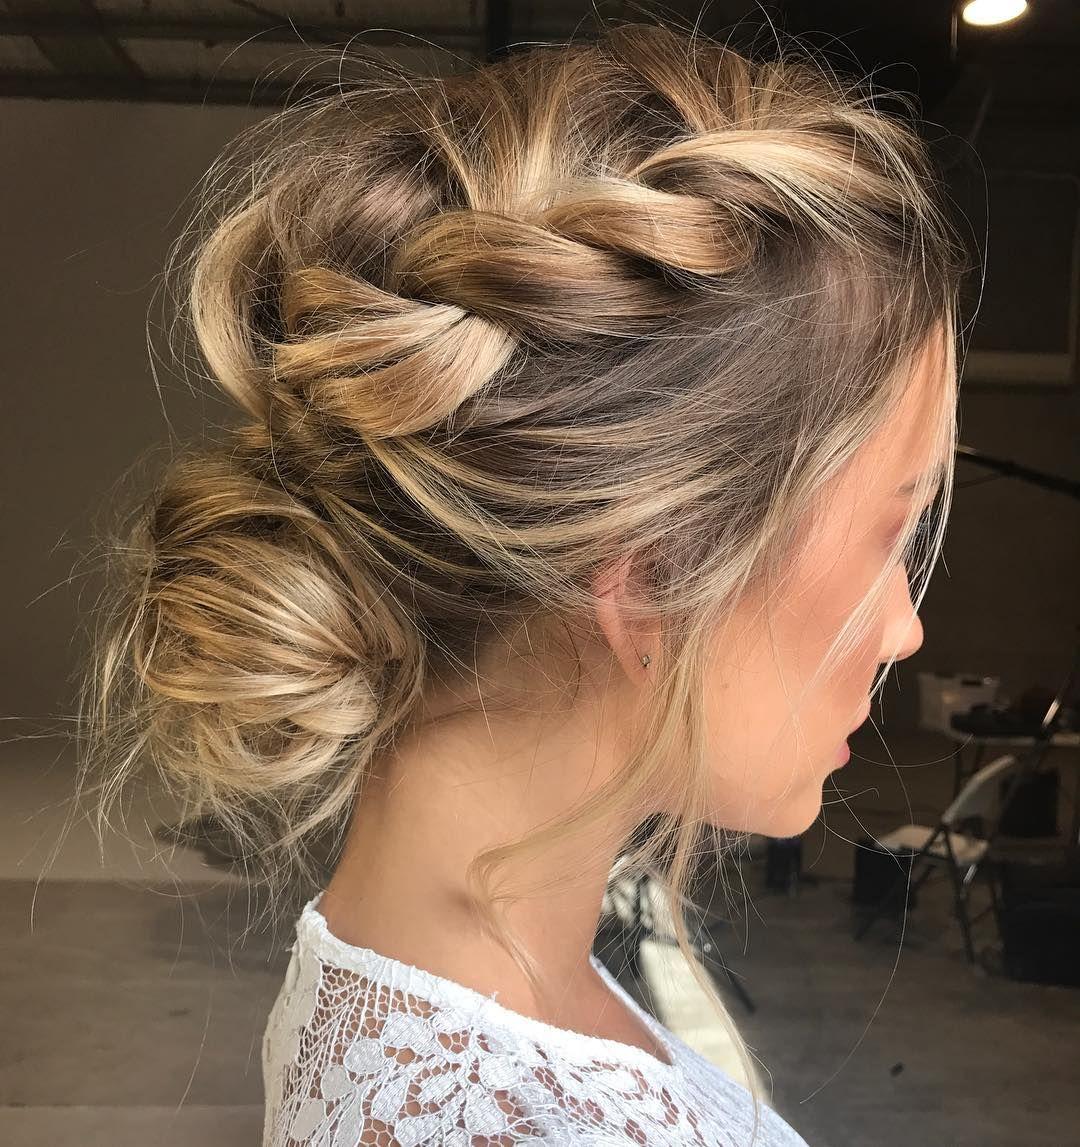 braided headband updo hairstyle tutorial | hair